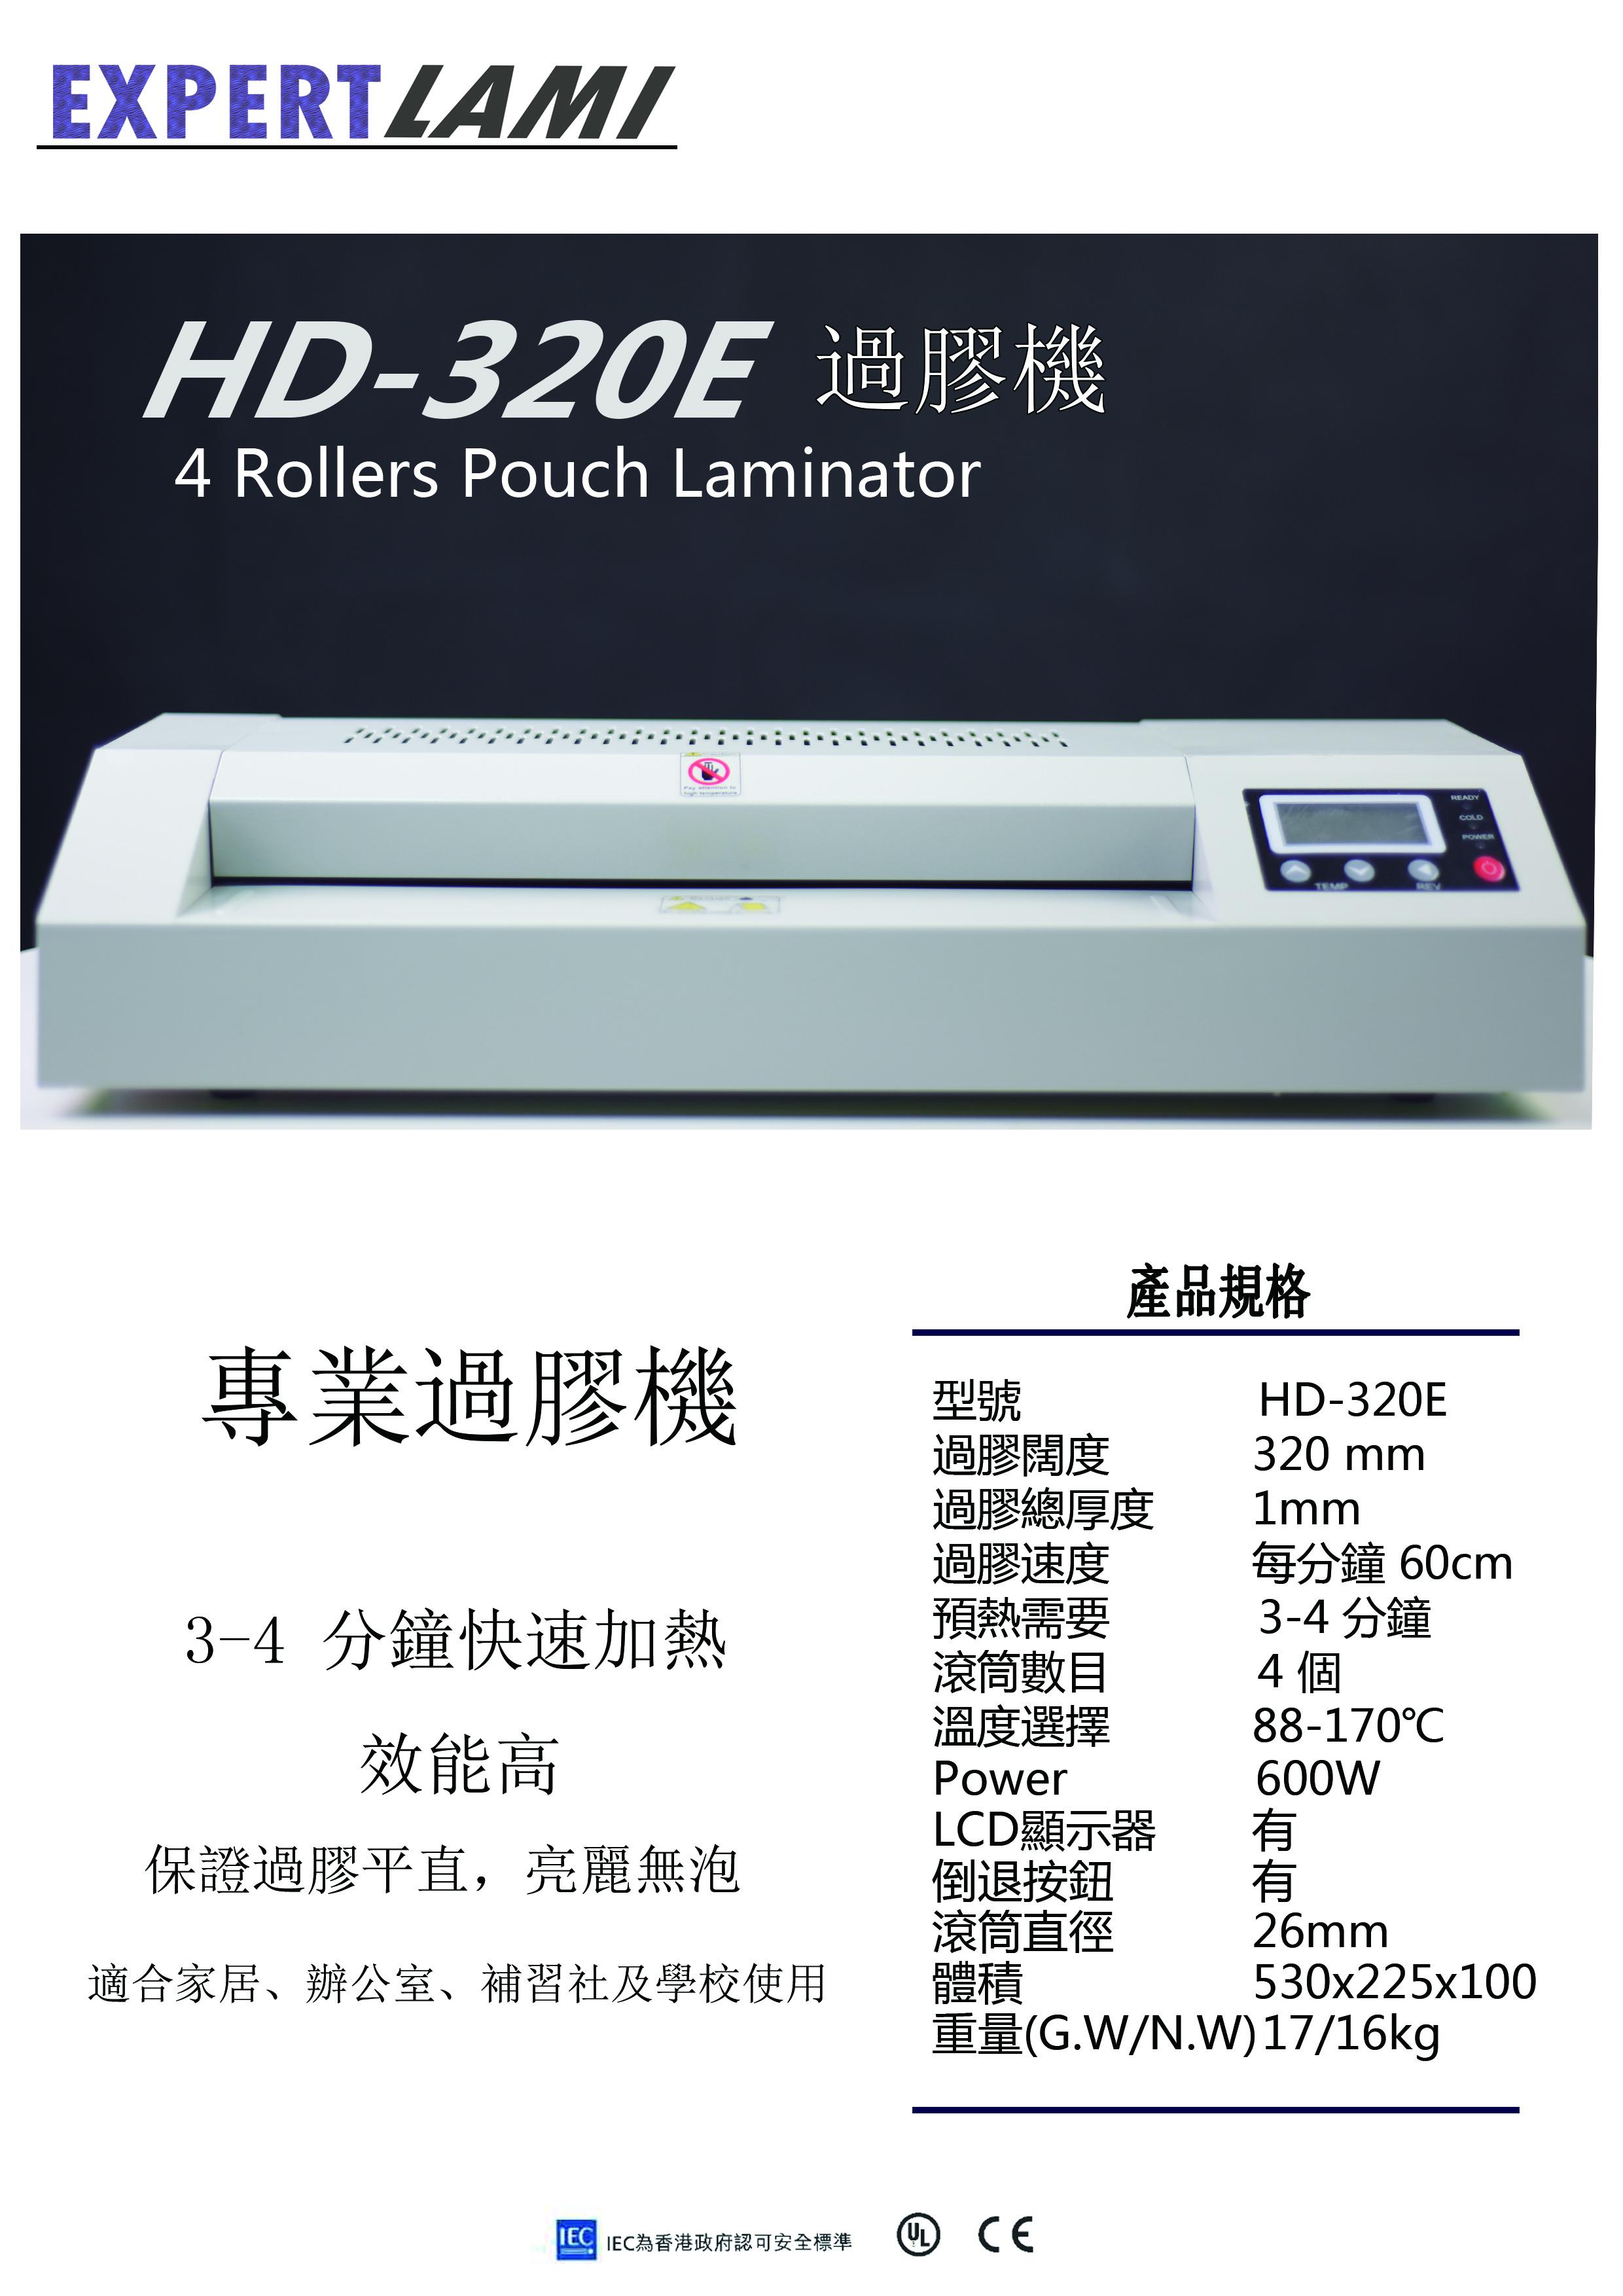 World Trade Office Equipment Sales Maintenance Service Since 1978 Ideal 2245 4 Mm Paper Shredder Gw Nw 17 16kg